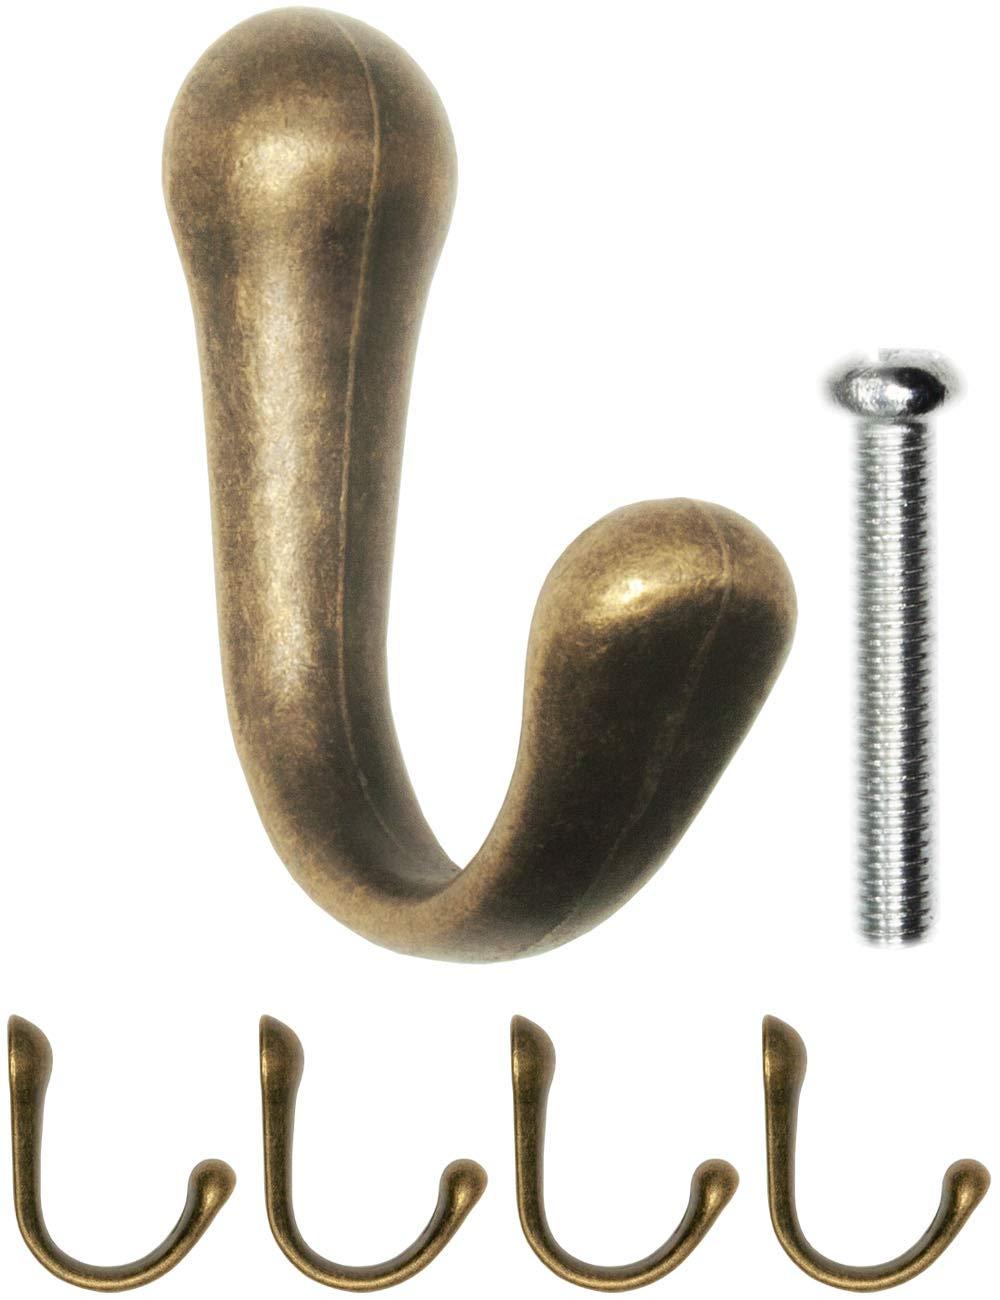 Garderoben-Haken bronze Antik-Haken Vintage Landhaus Retro Handtuch-Haken Kleider-Haken M/öbel-Haken 4er Set 42 X 32mm antikes Bronze-Design FUXXER/®